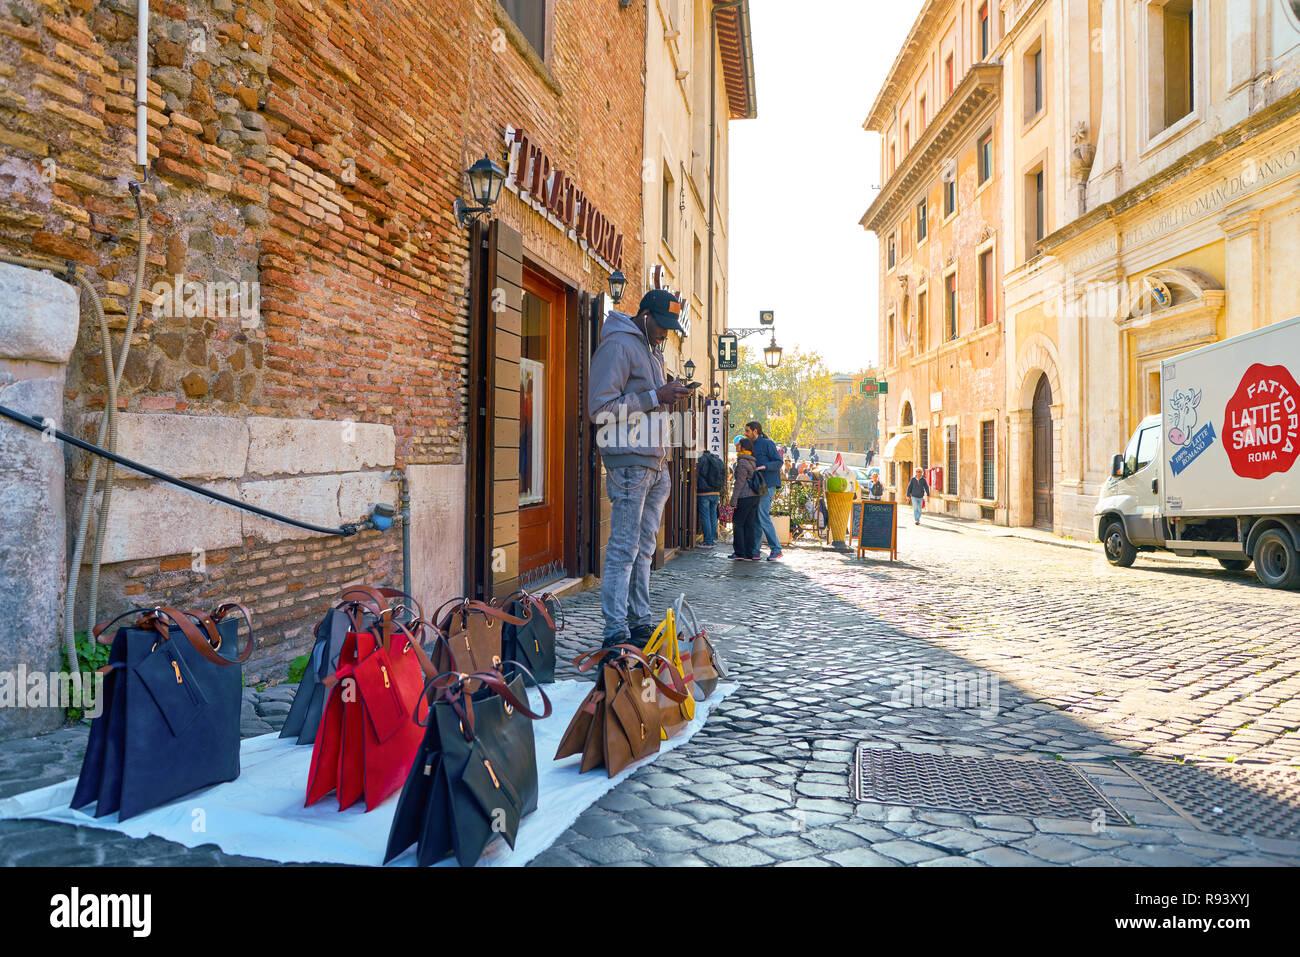 Fake Bags Immagini   Fake Bags Fotos Stock - Alamy e8626af9070a